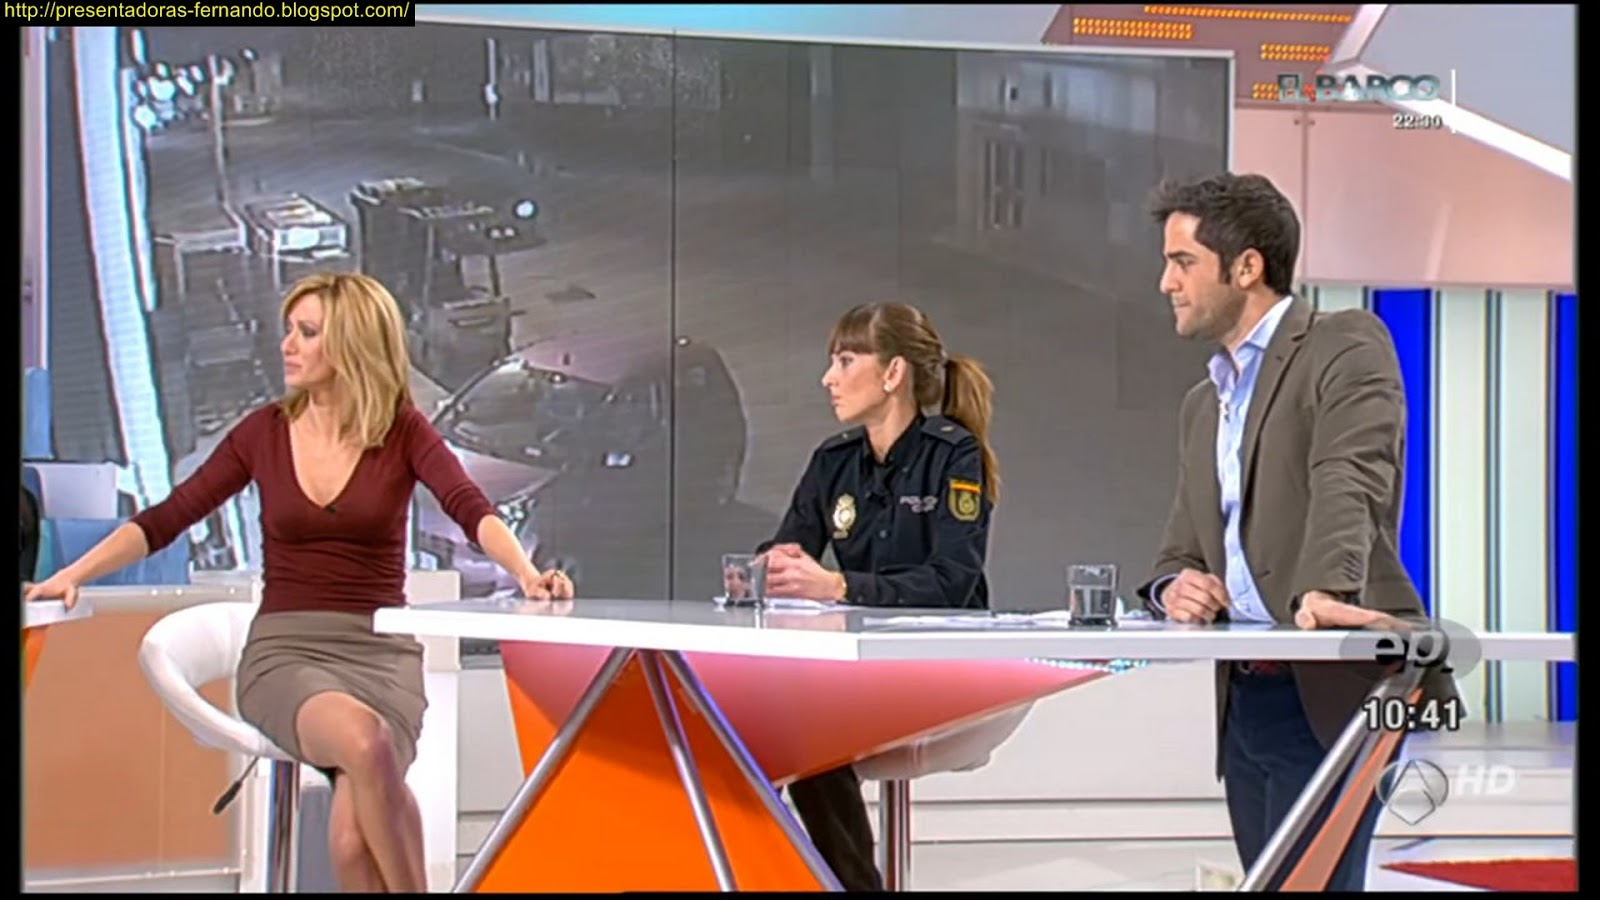 Presentadoras fernando susana griso espejo publico 10 1 2013 - Espejo publico hoy ...